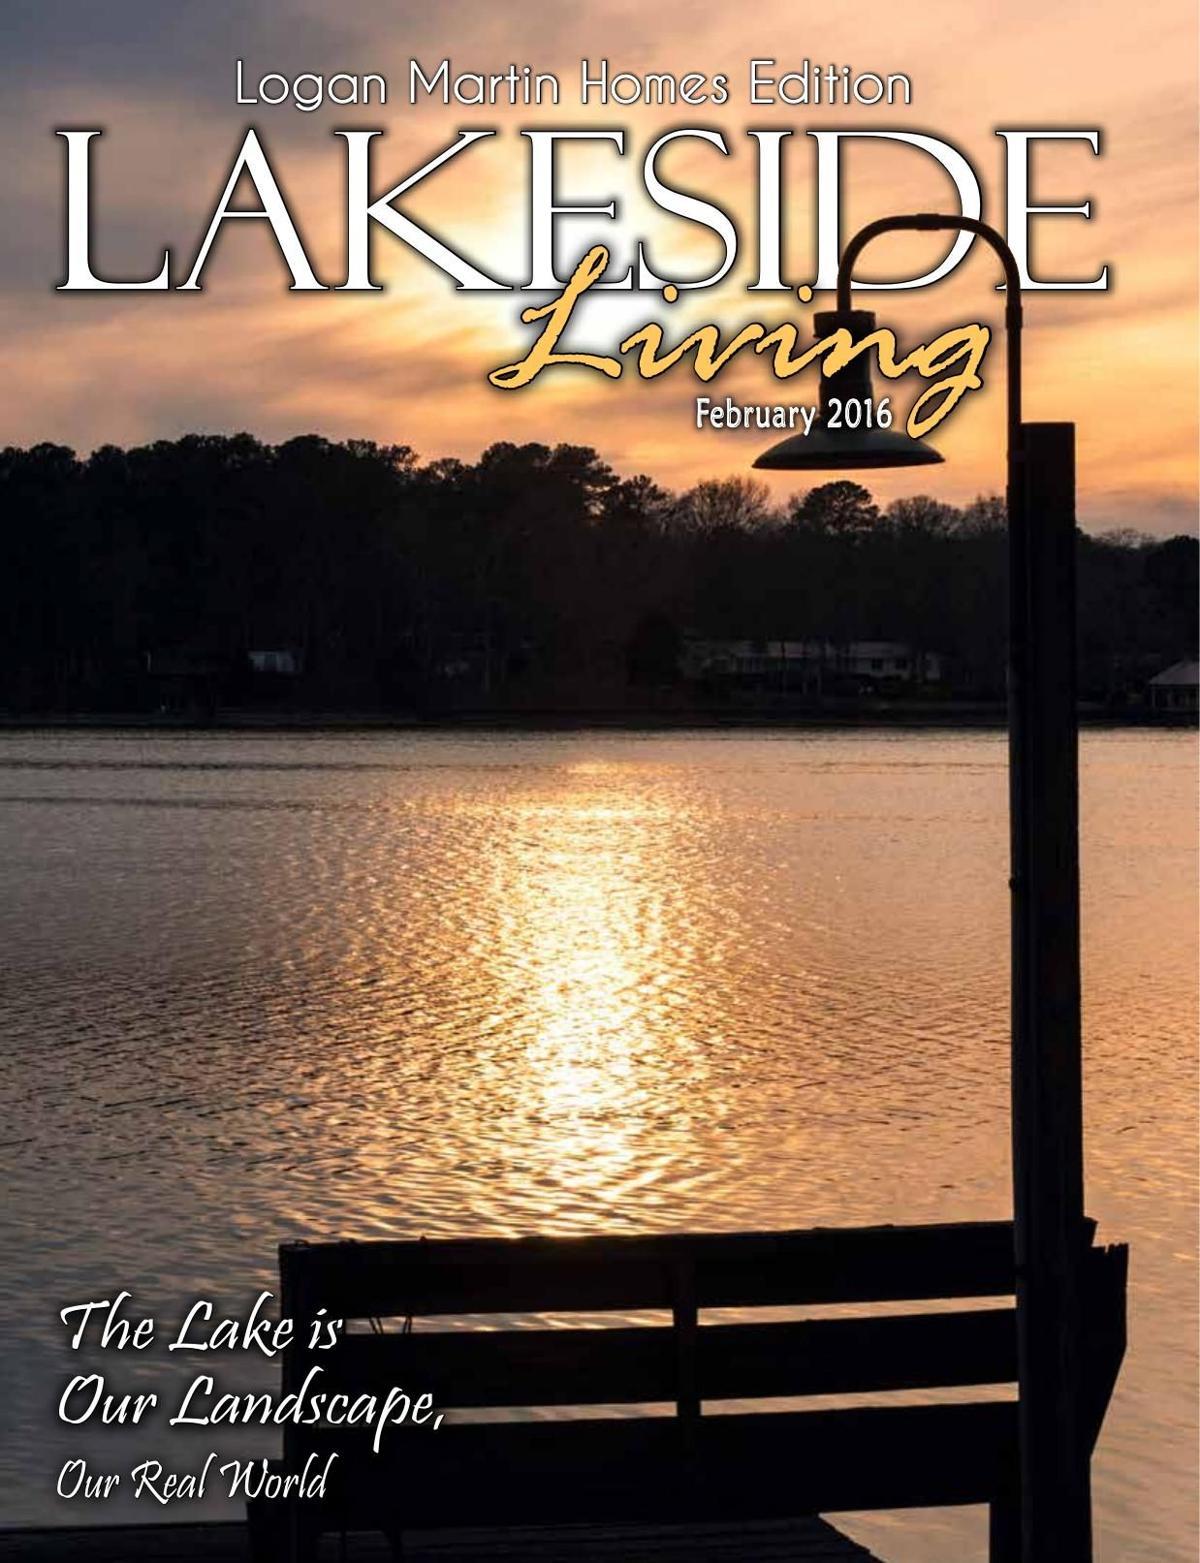 Lakeside - February 2016